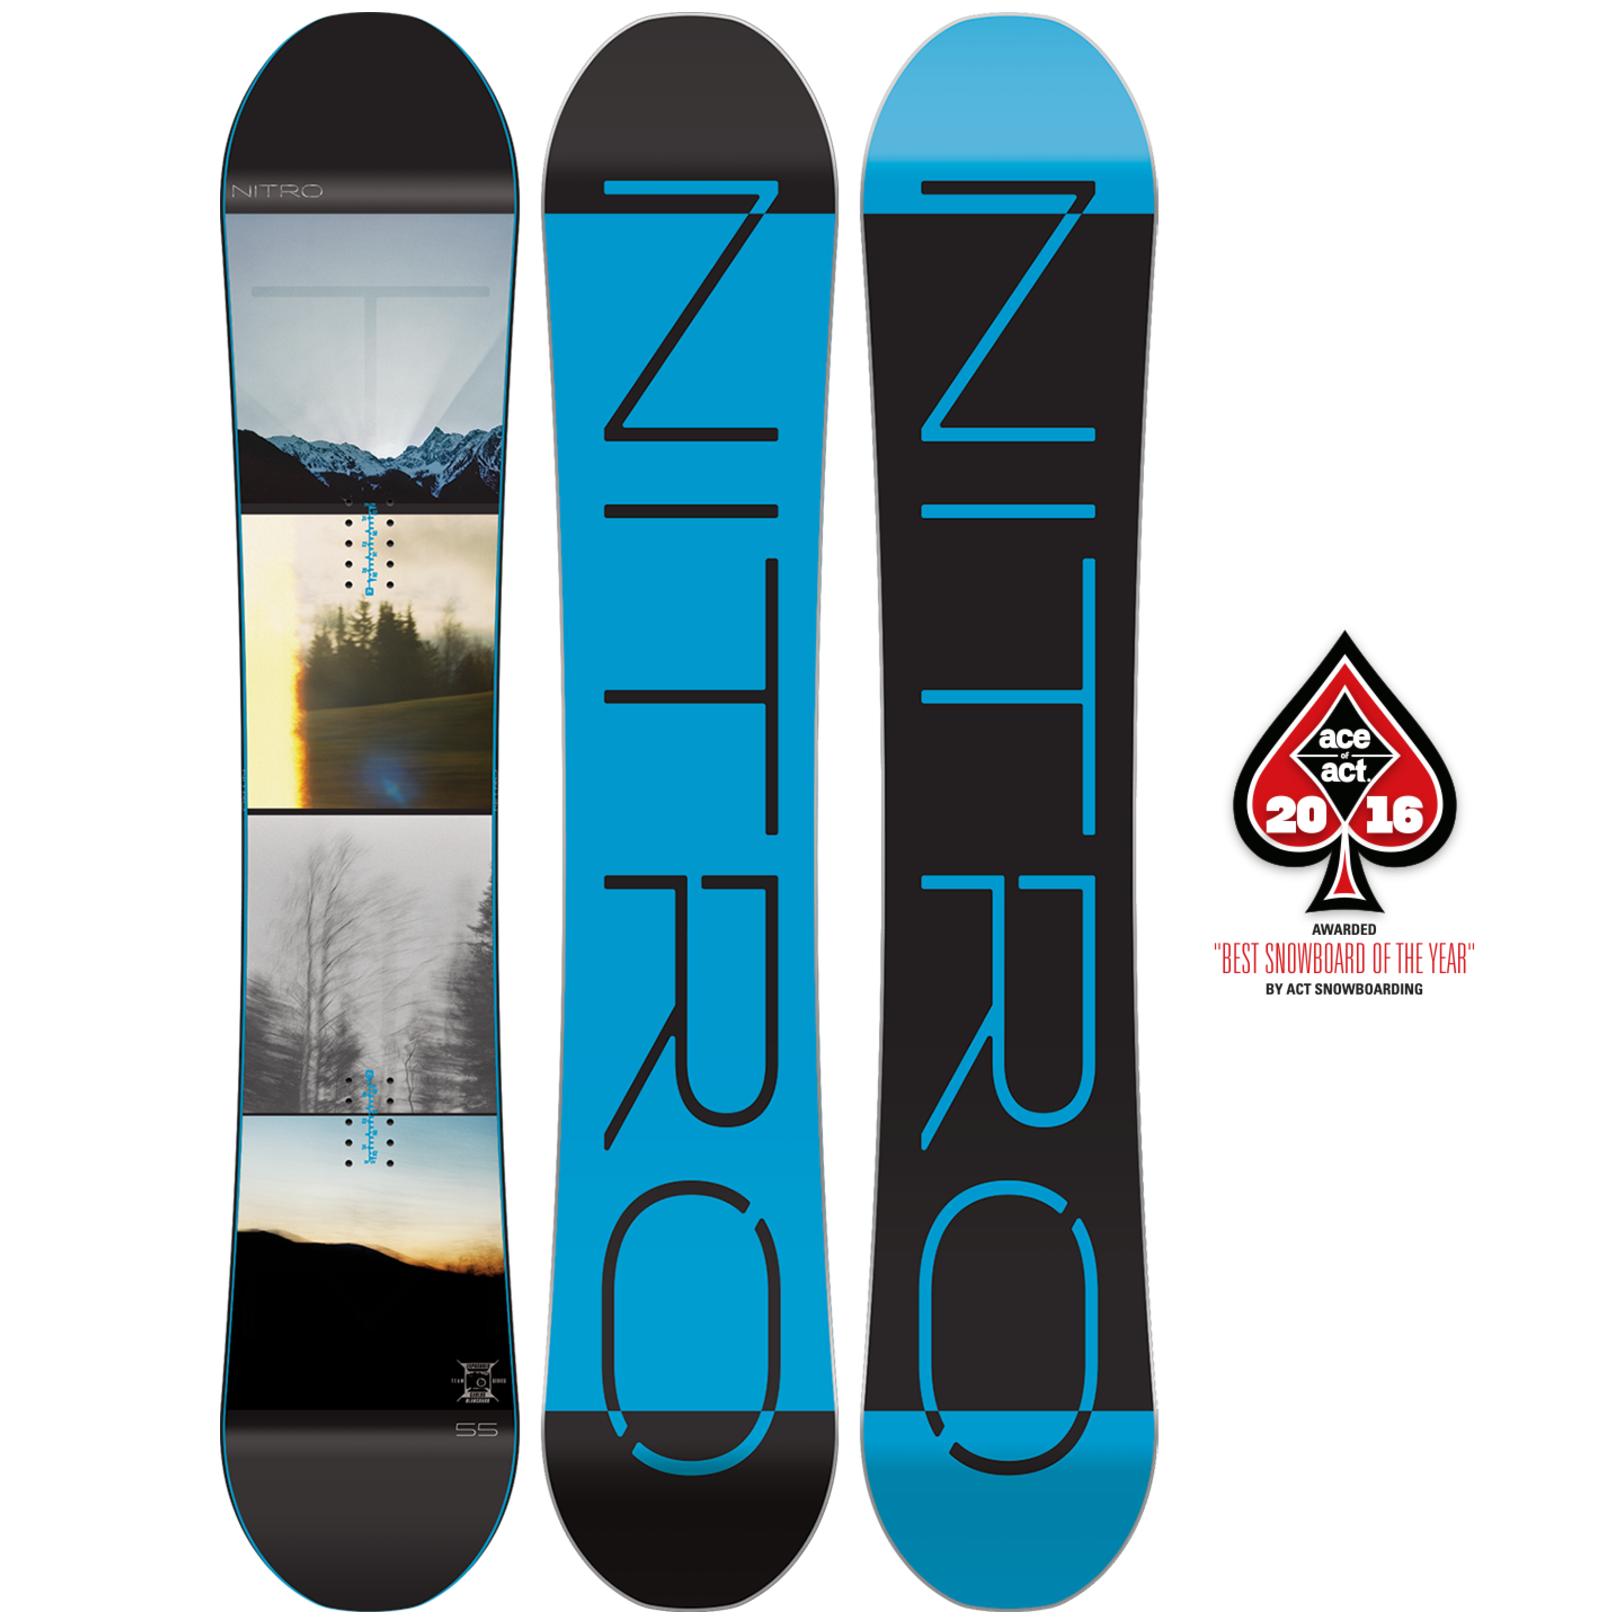 Boards - nitro Team Exposure Gullwing  8110c5d9b16f